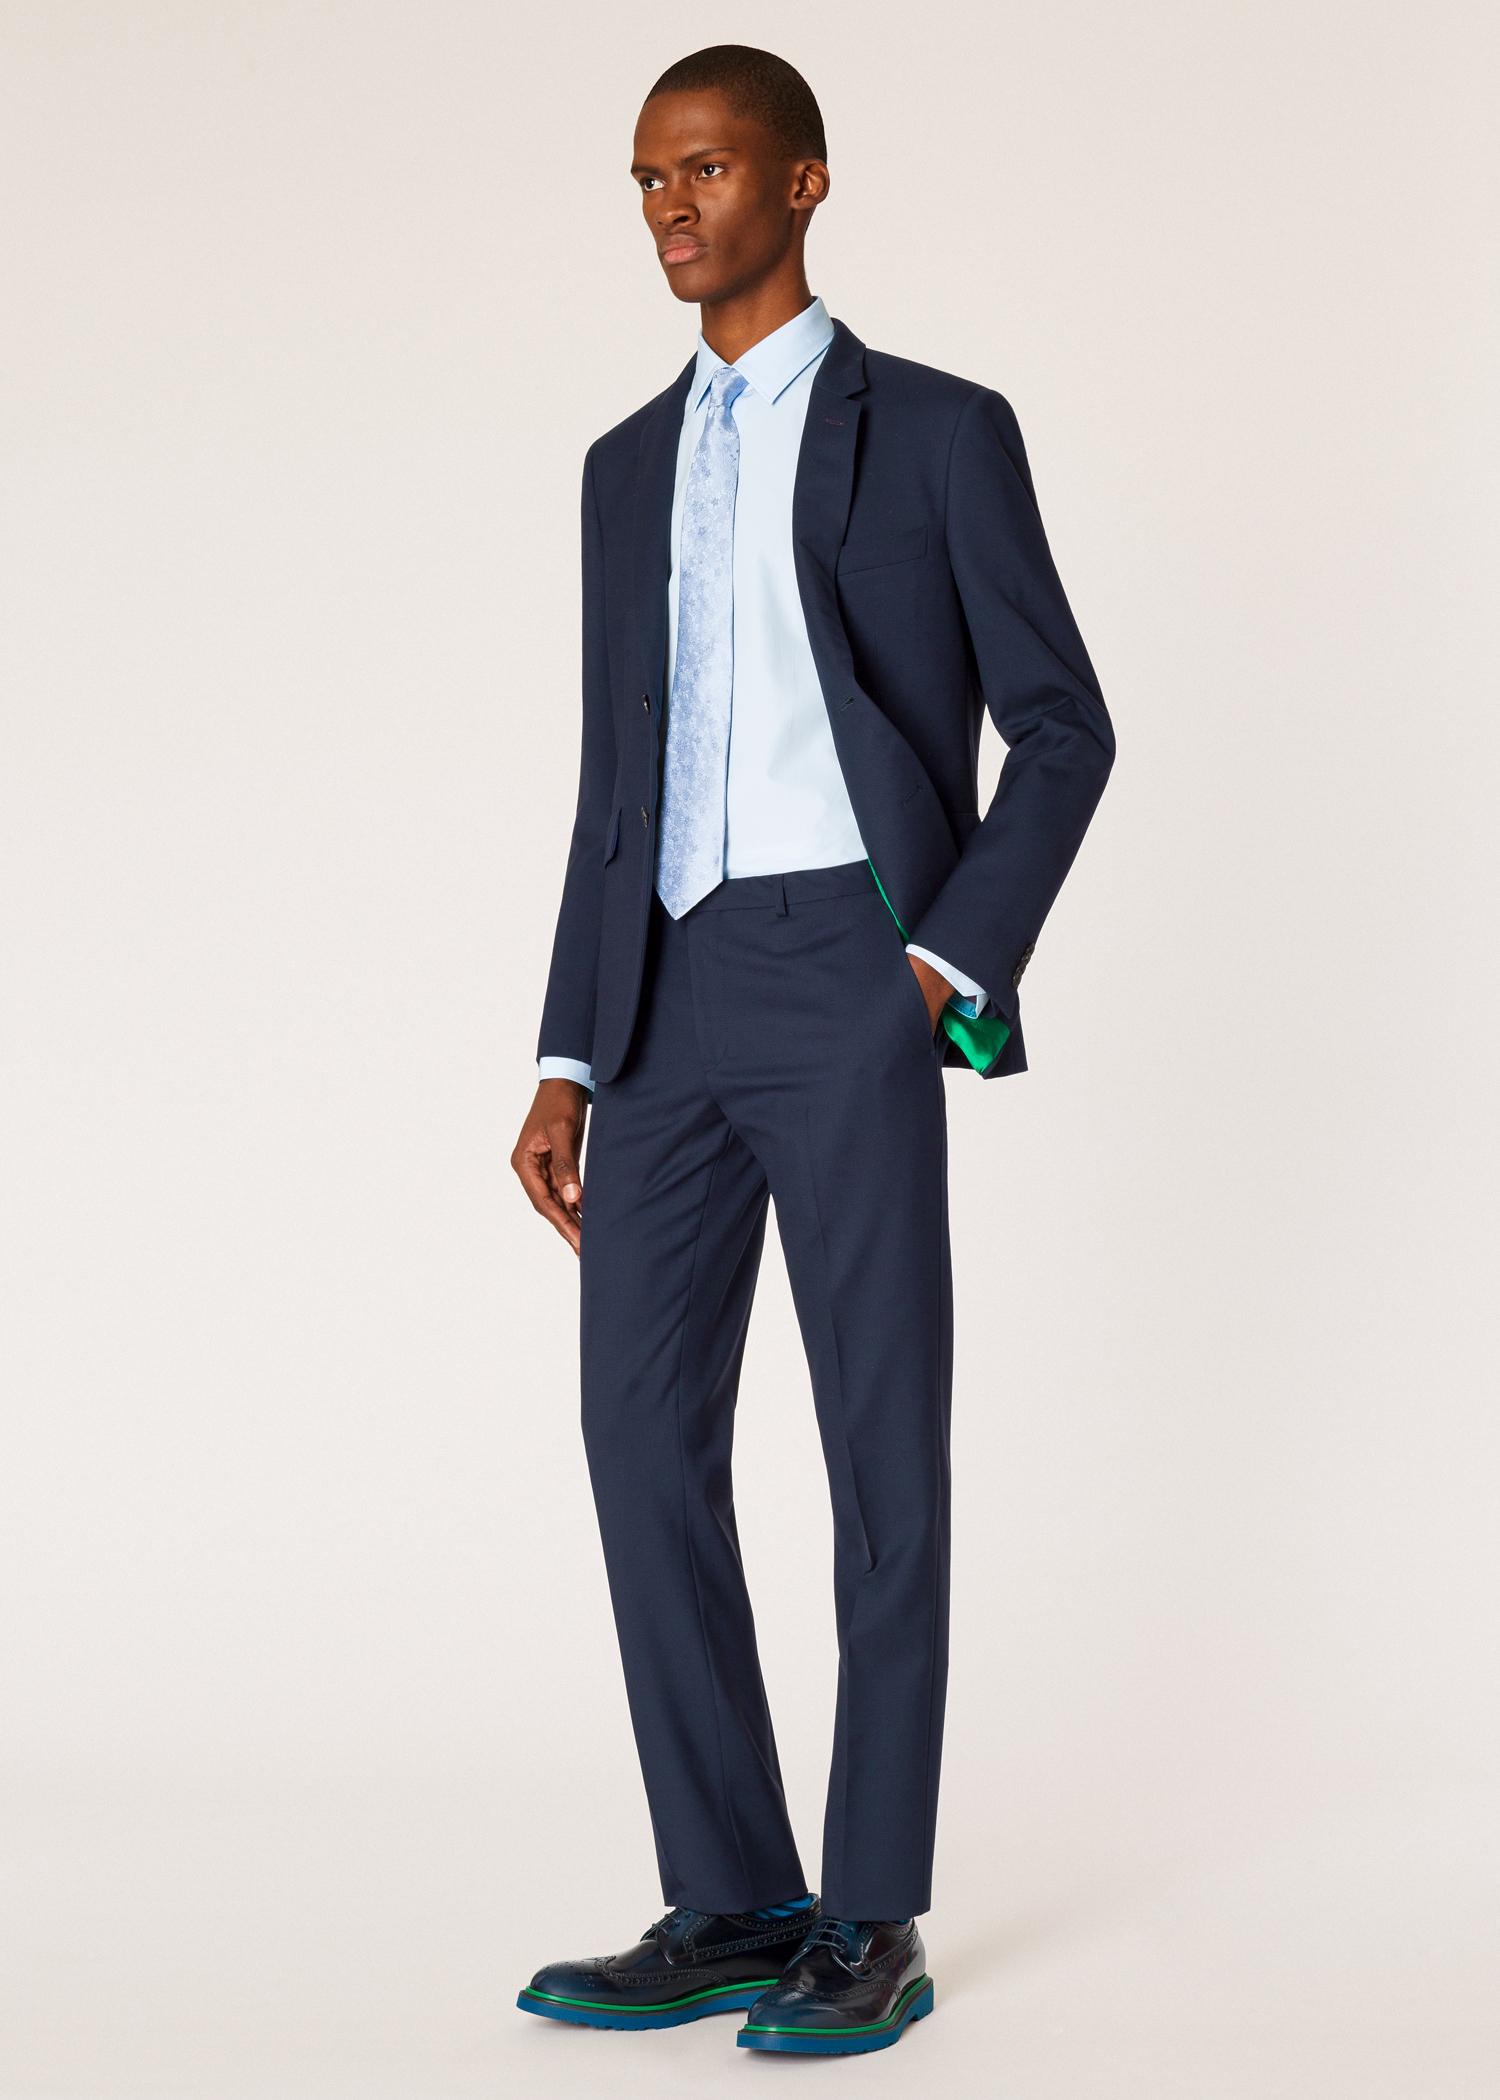 823804ffd8 The Kensington - Men's Slim-Fit Navy Wool Suit 'A Suit To Travel In ...